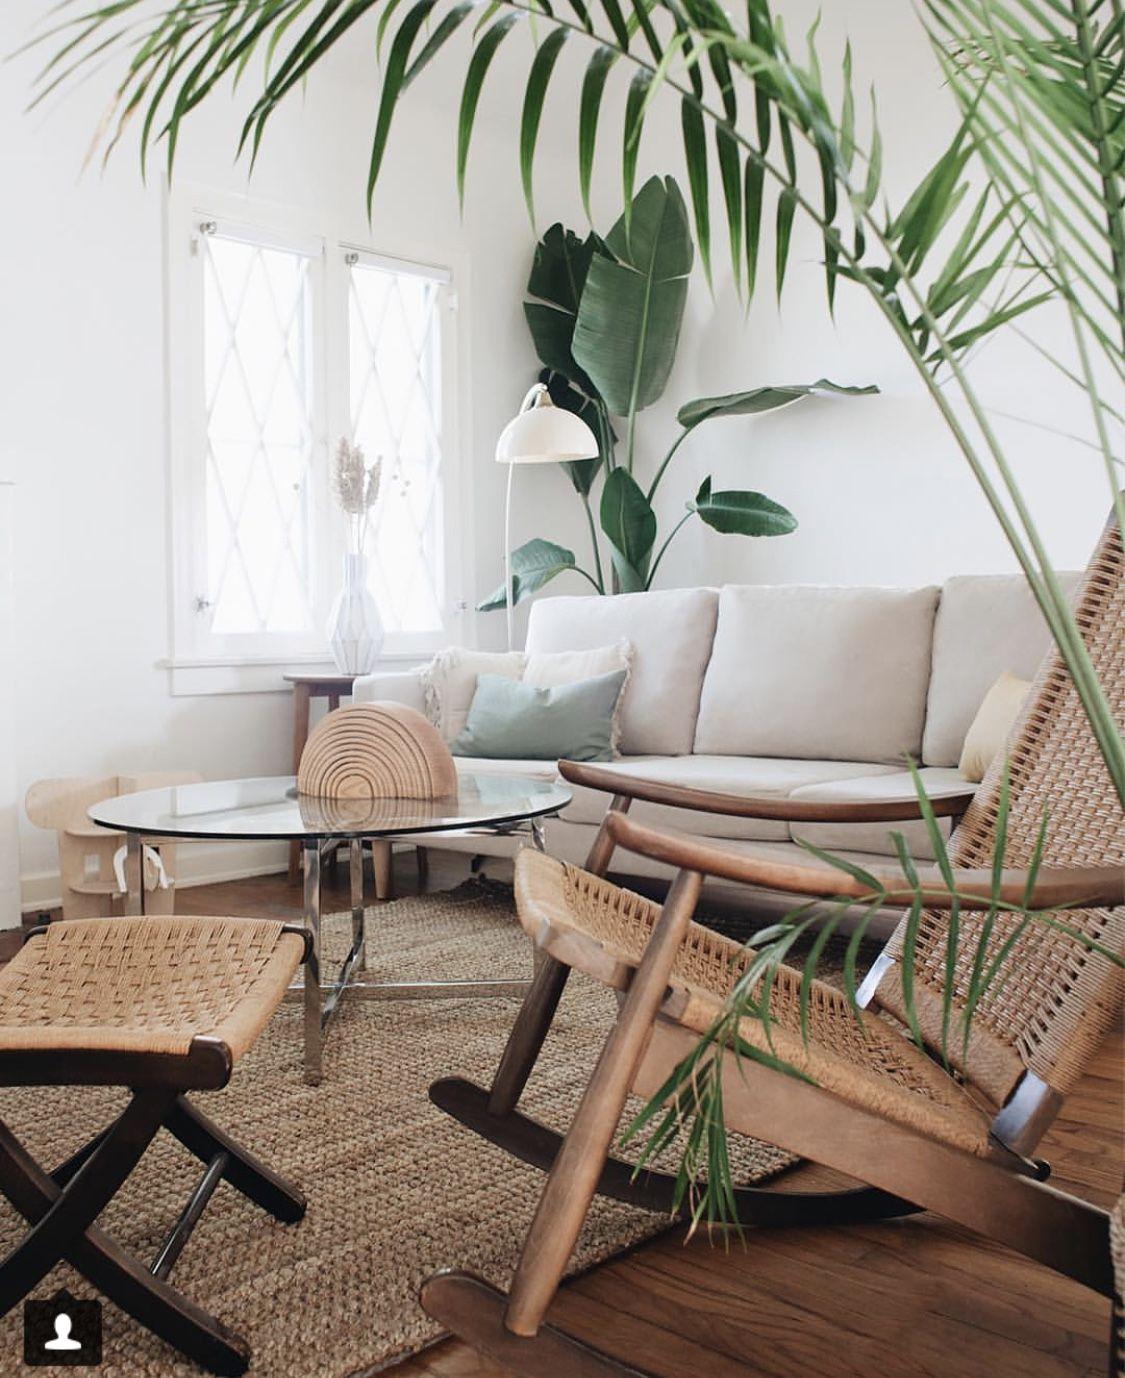 B Love Lounge Rocking Ratan Chair Rug Plants Not Coffee